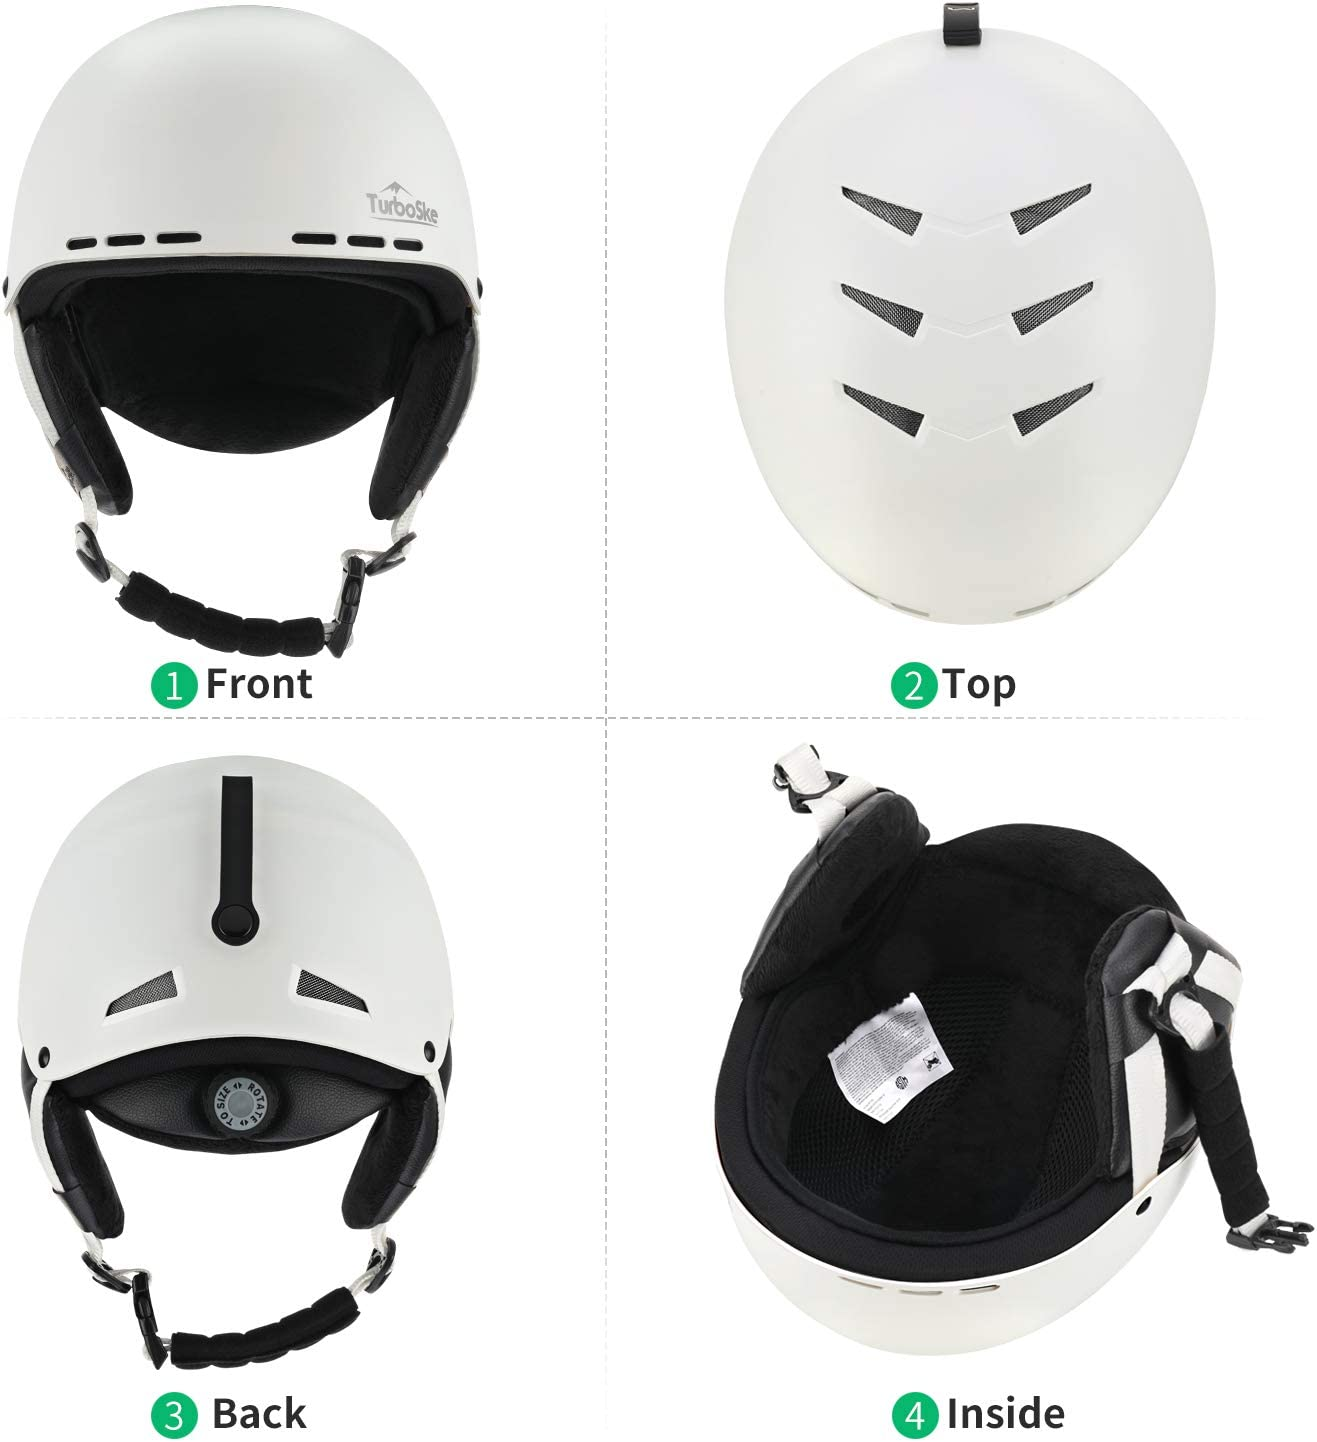 Snowboard Helmet Snow Sports Helmet Women and Youth TurboSke Ski Helmet ASTM Certified for Men